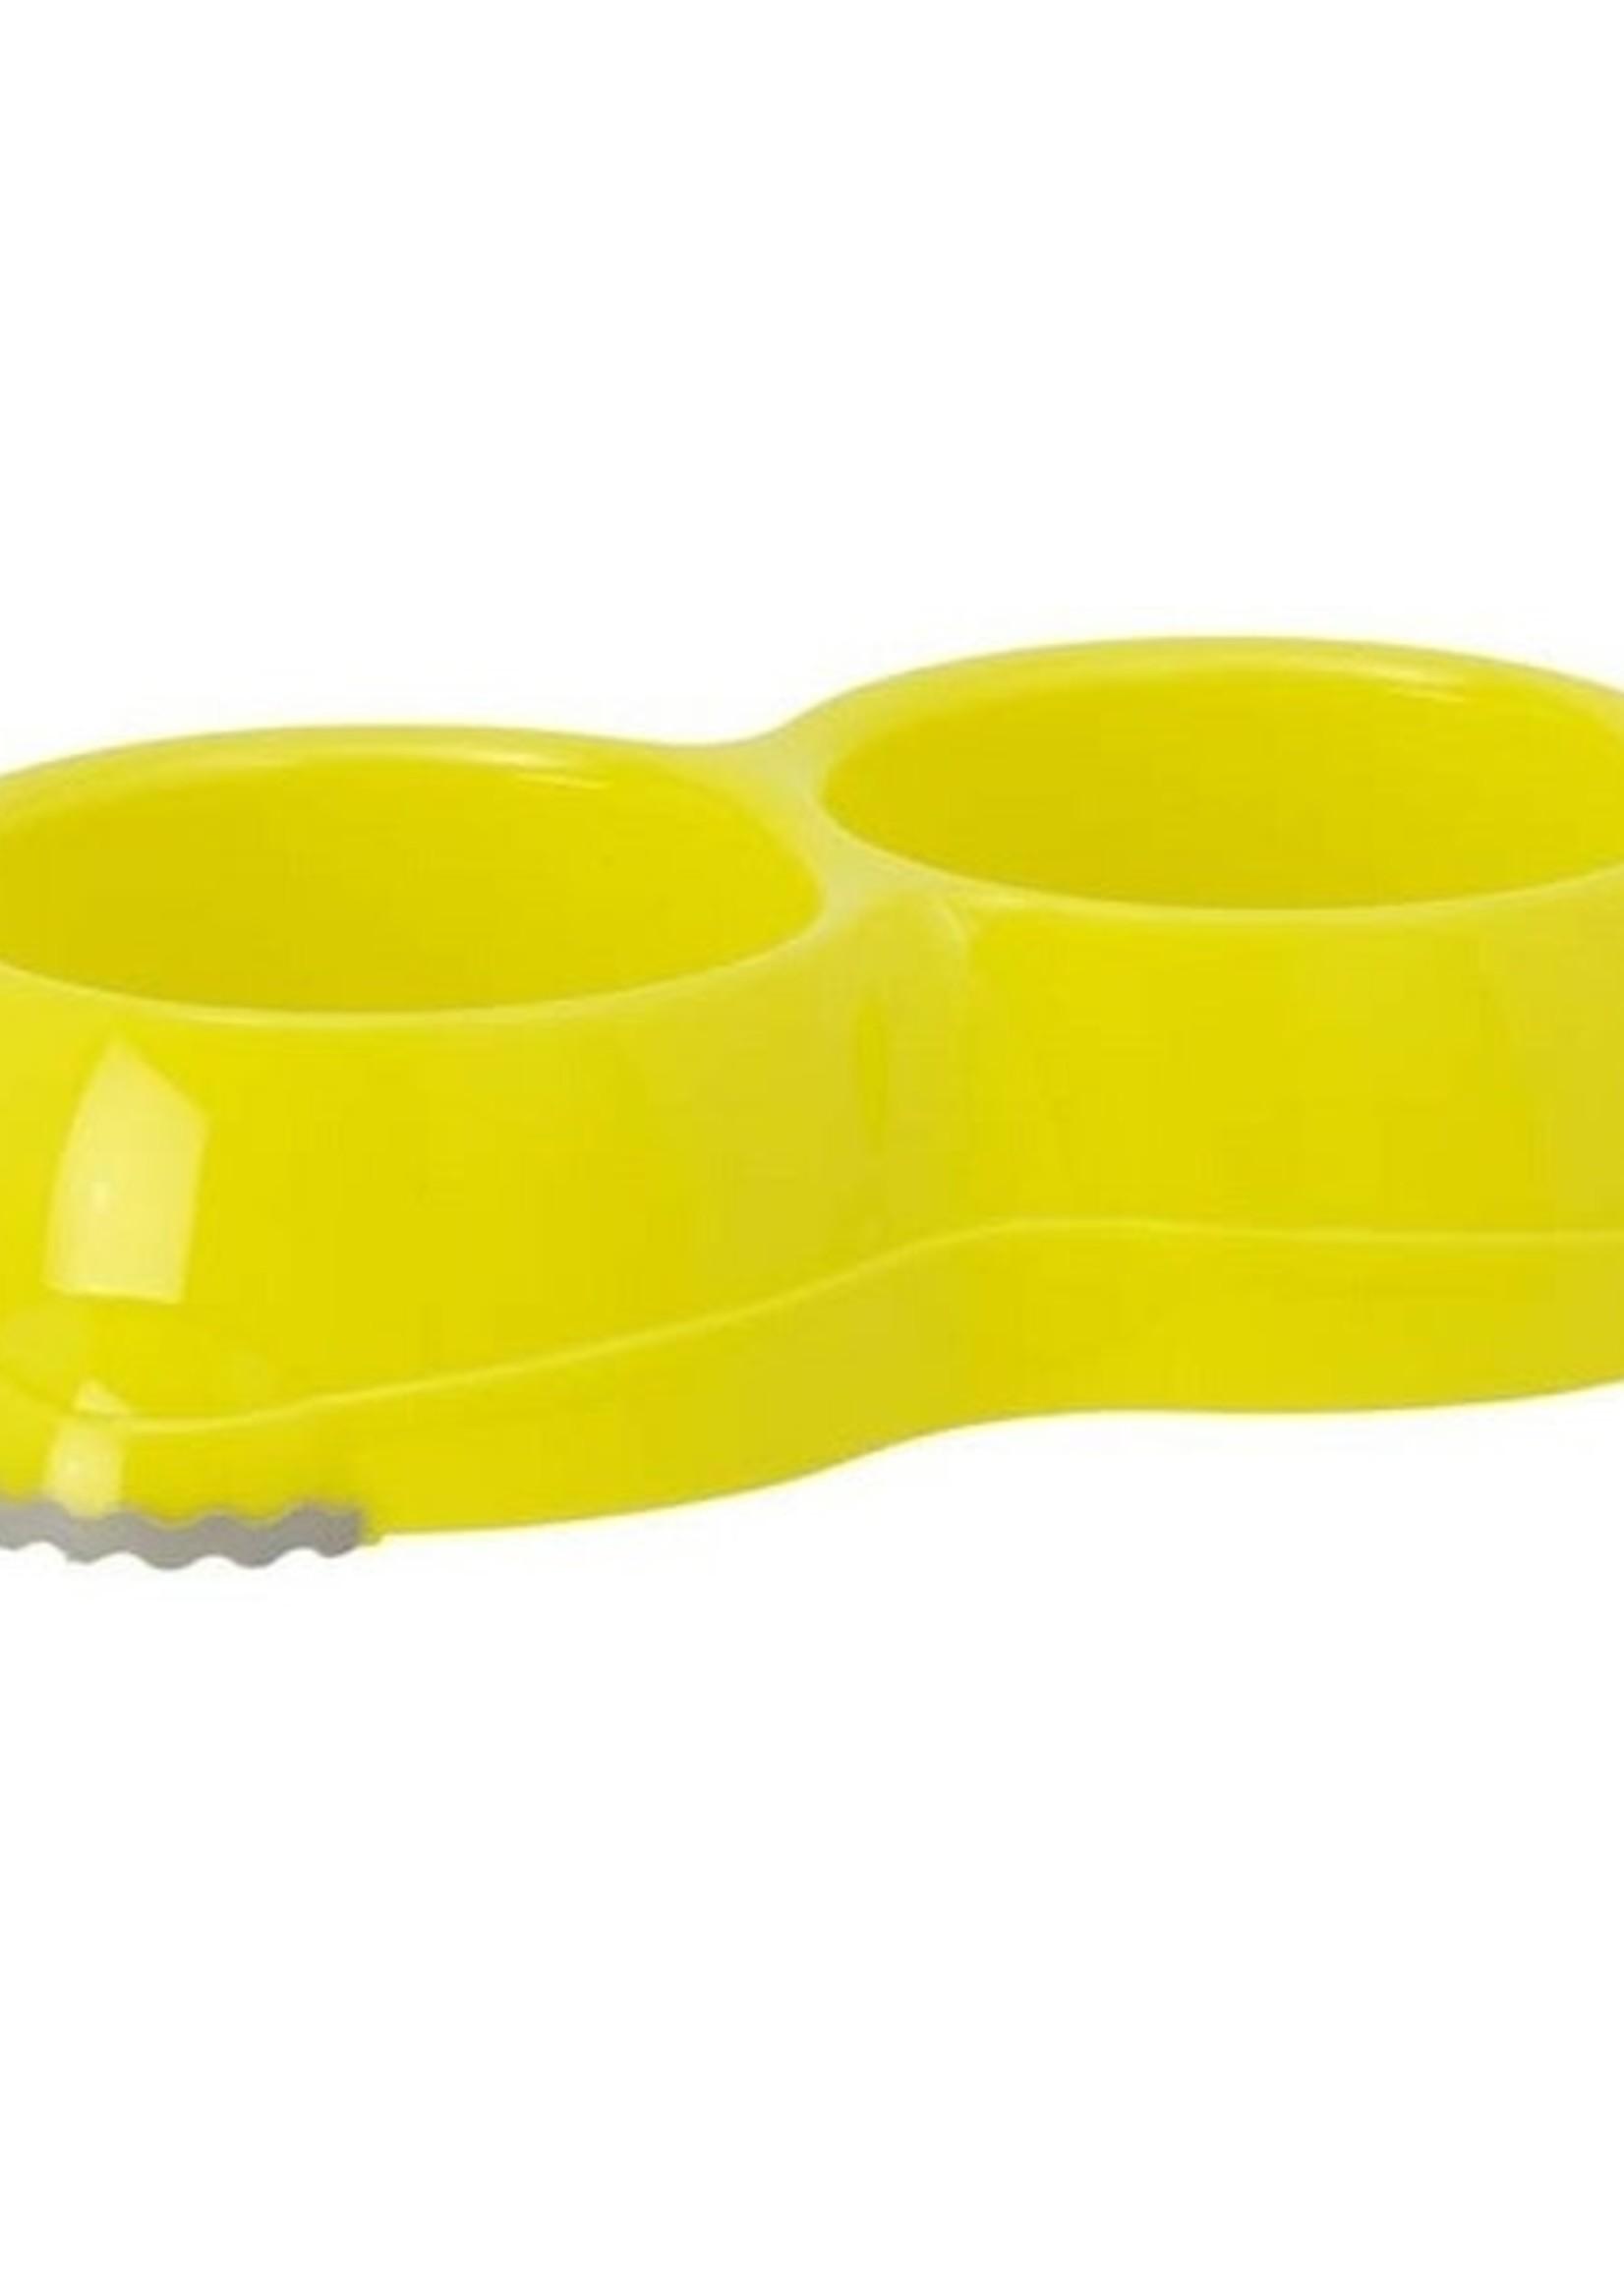 Mod Double Smarty No-Slip Bowl -Small 11oz